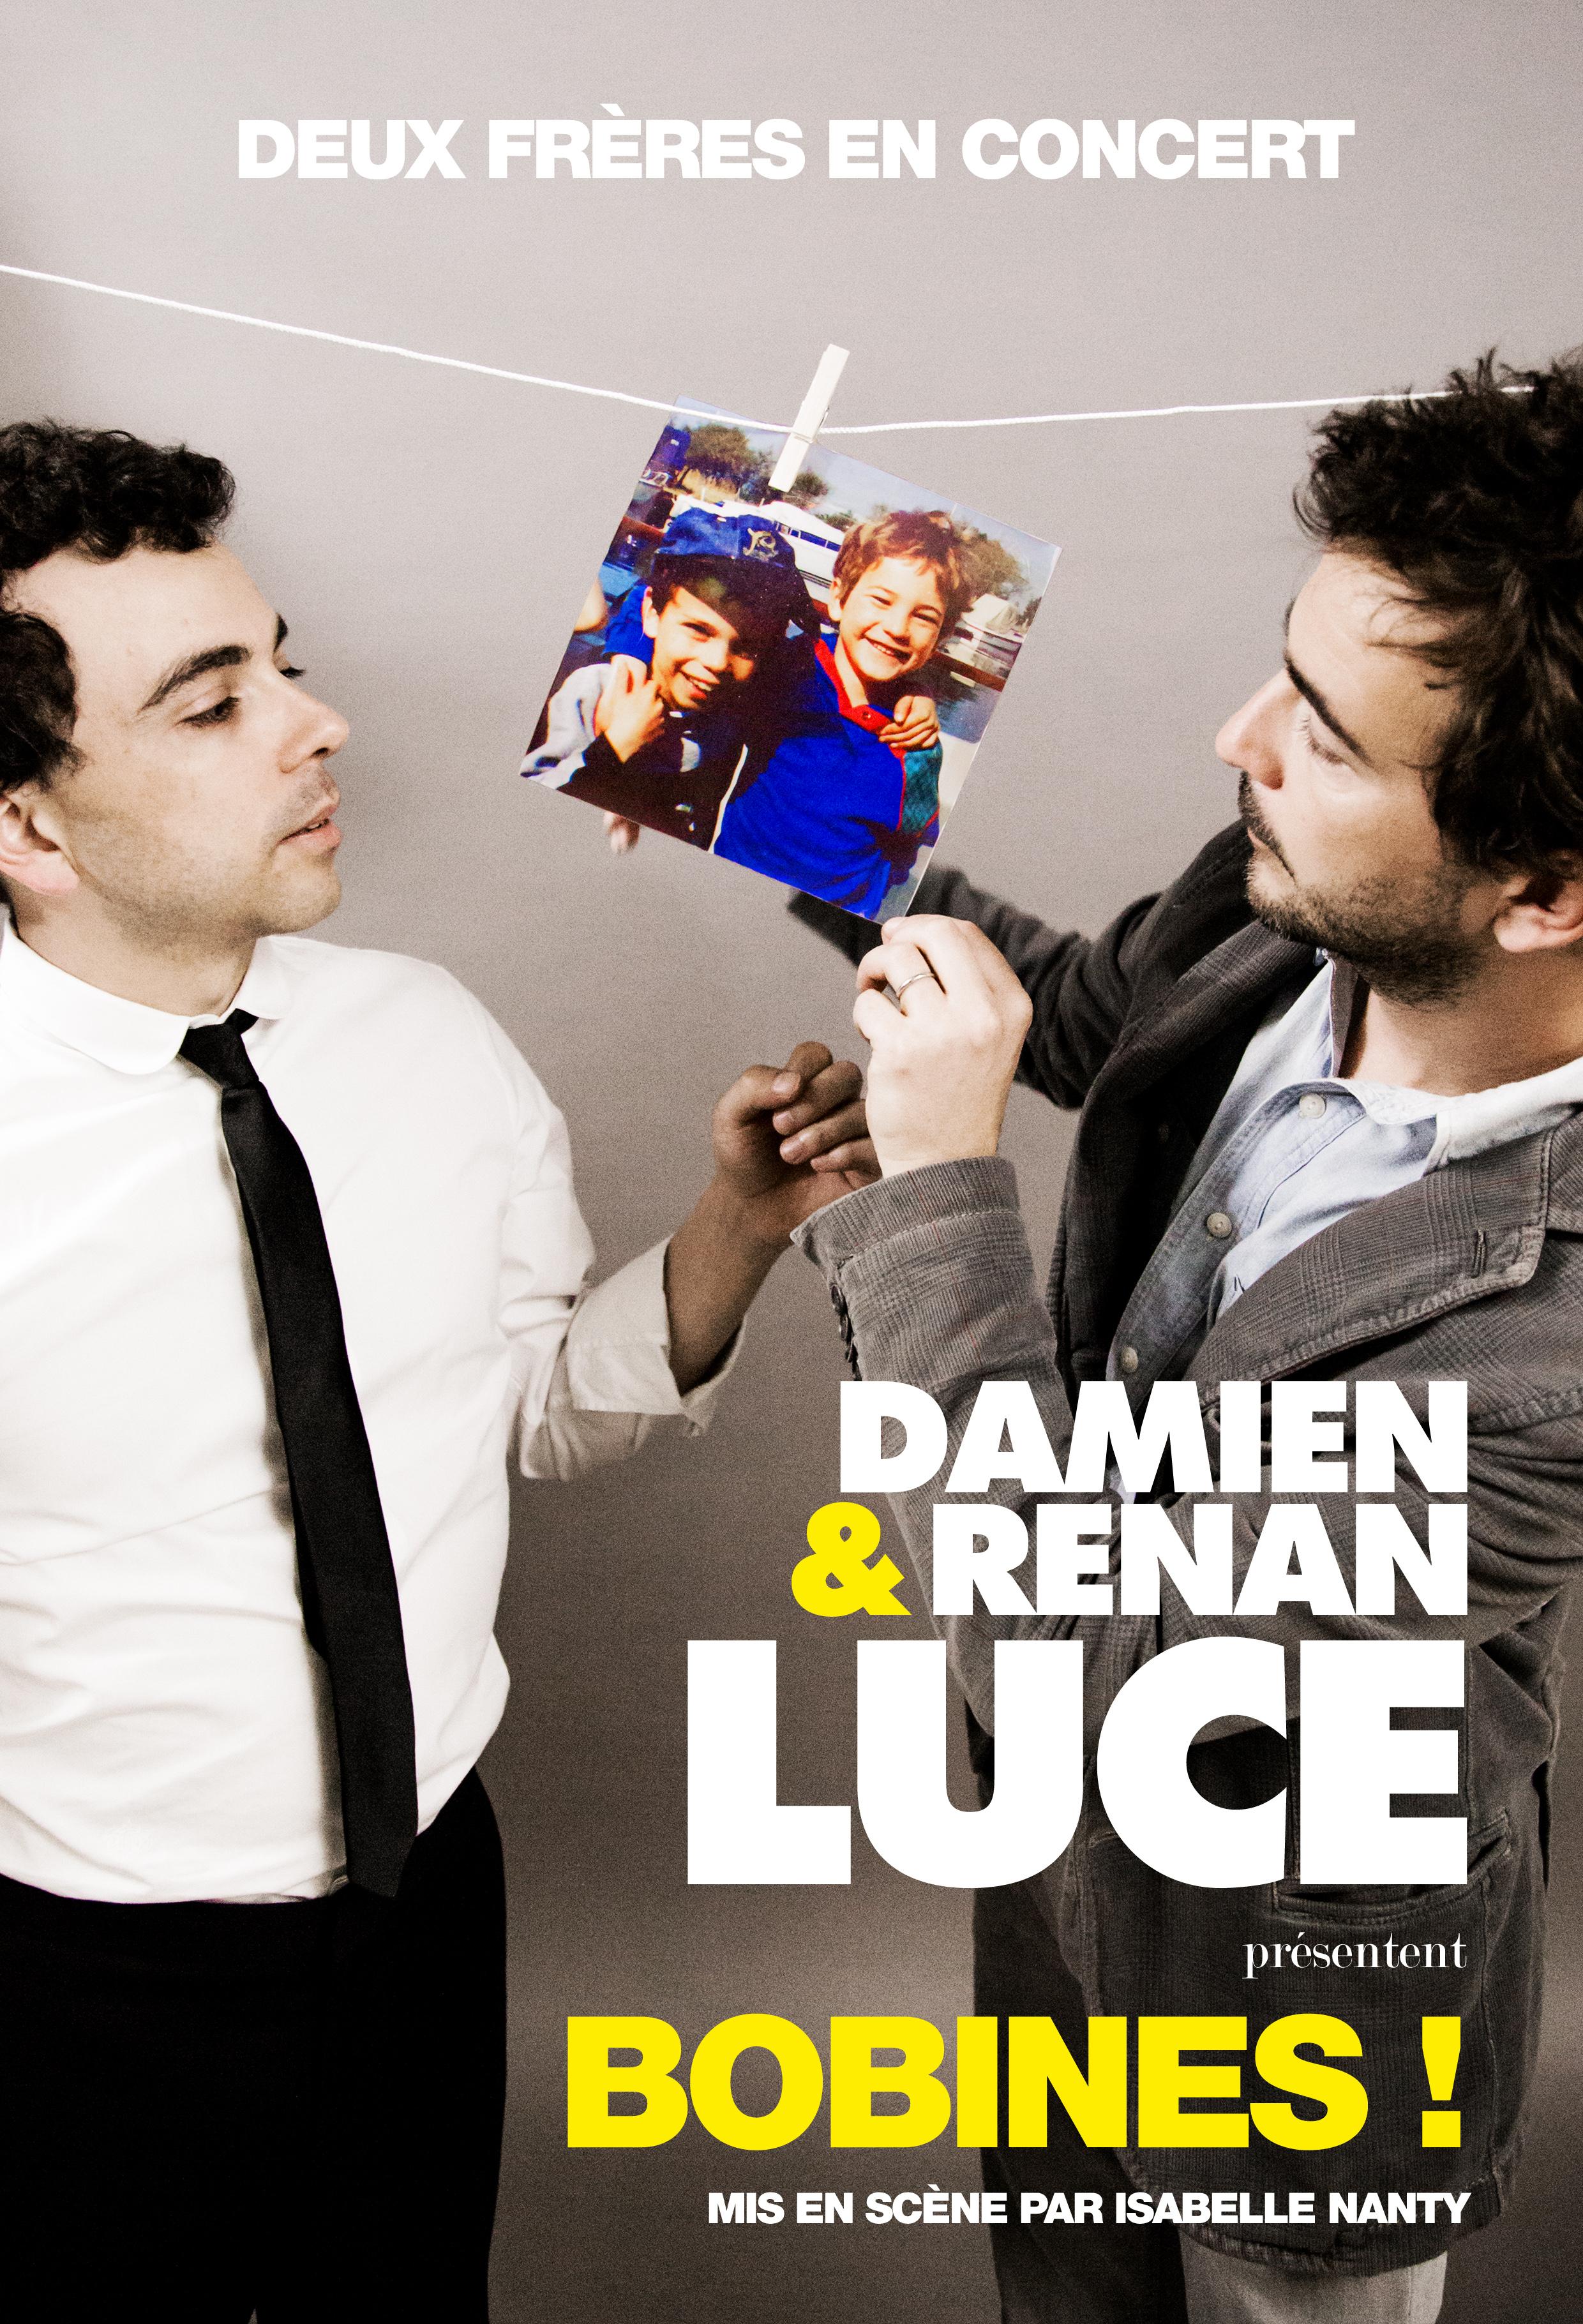 visuel_bobines_damien_renan_luce